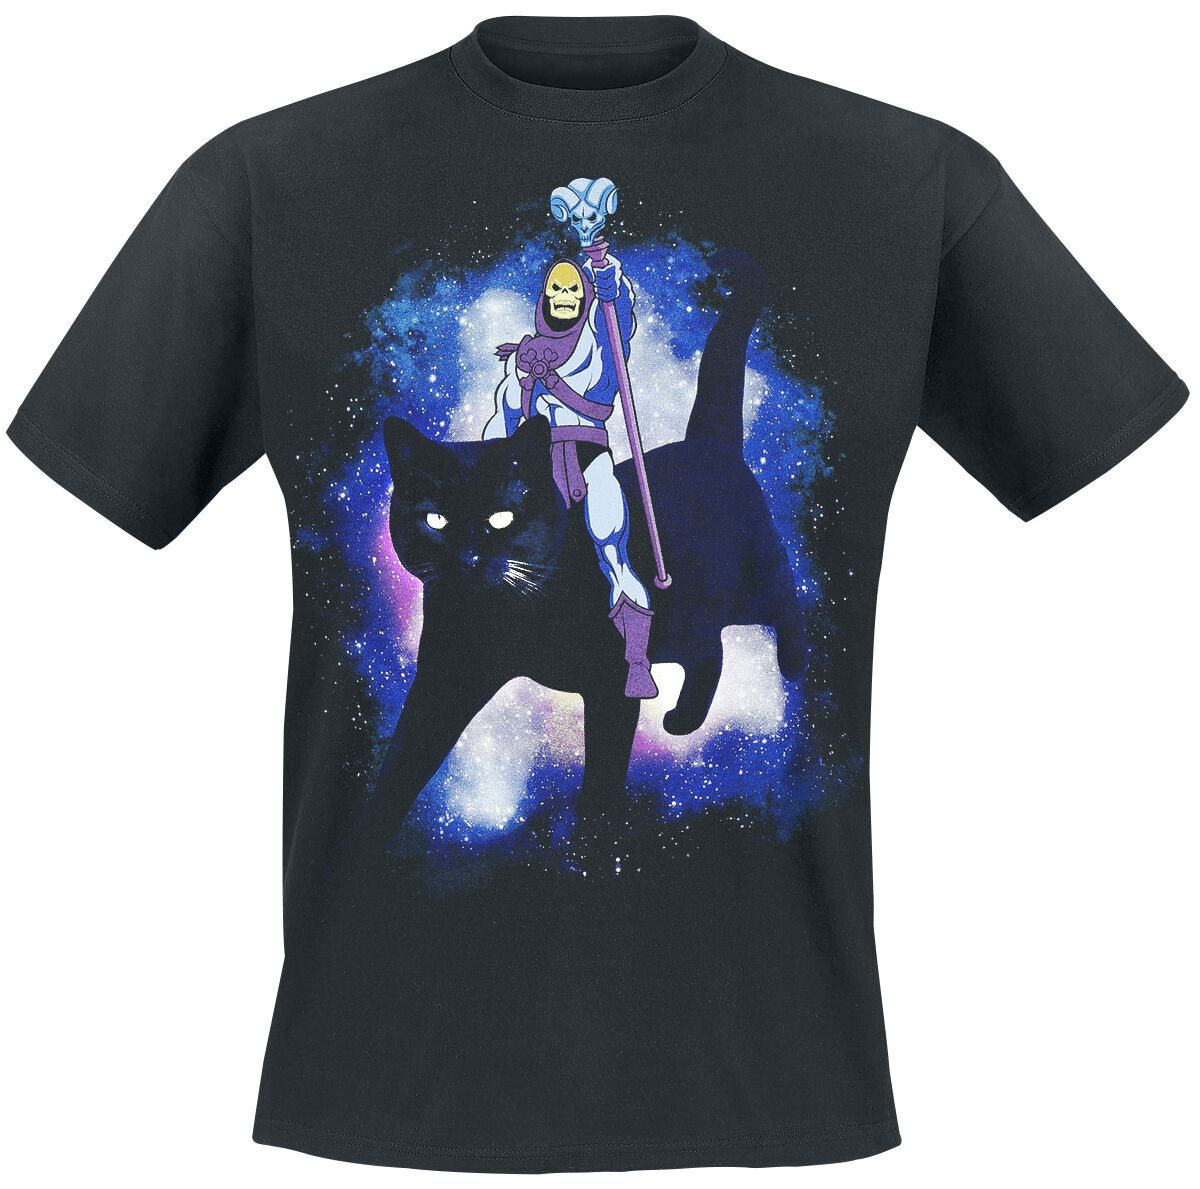 Merch dla Fanów - Koszulki - T-Shirt He-Man And The Masters Of The Universe Skeletor - Black Cat T-Shirt czarny - 355539